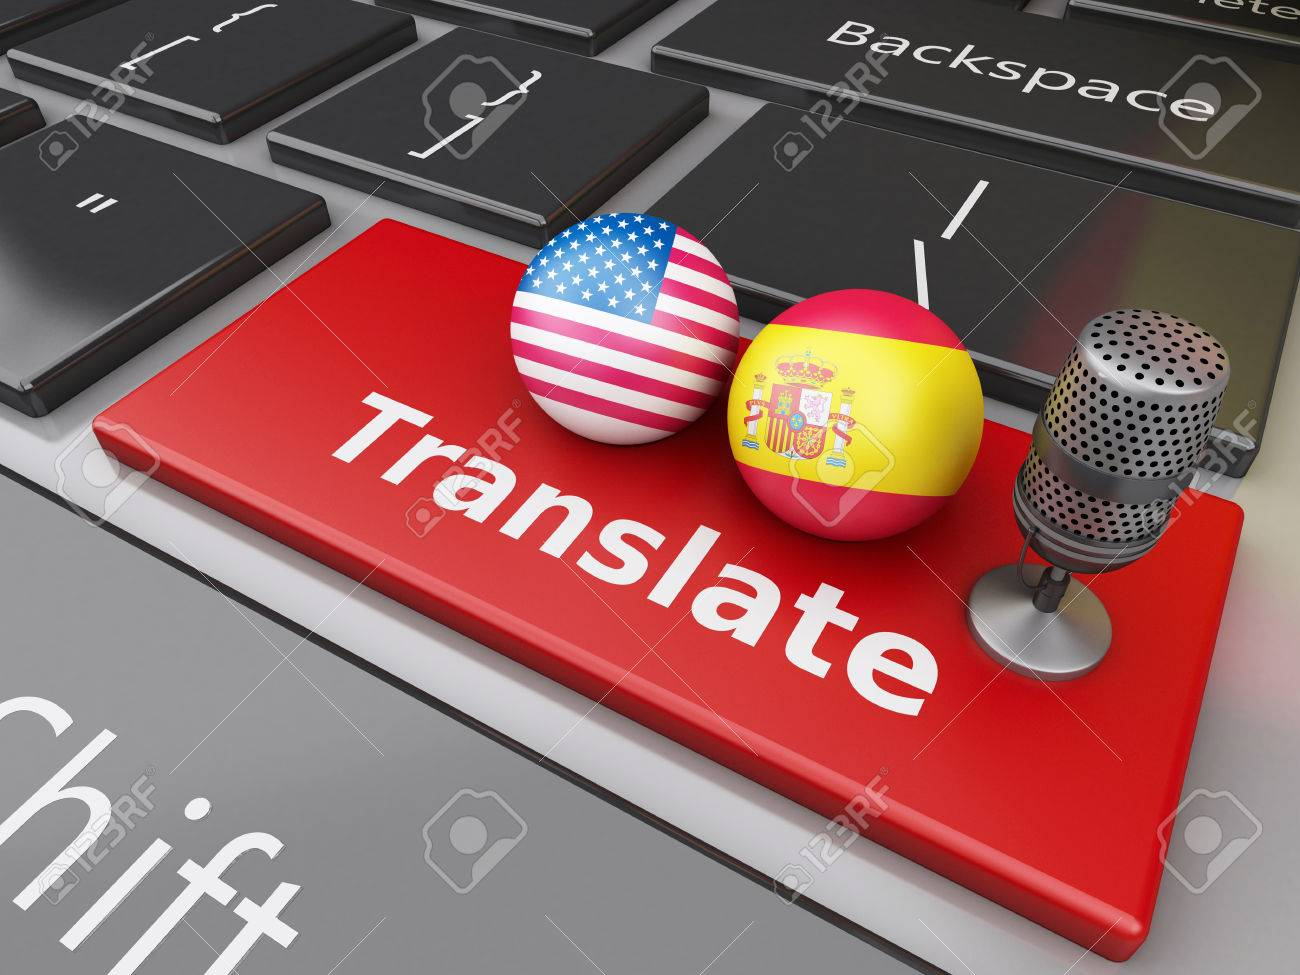 Spanish to english - Translate Spanish To English Free Translate Spanish English Free Translate Spanish And English On Computer